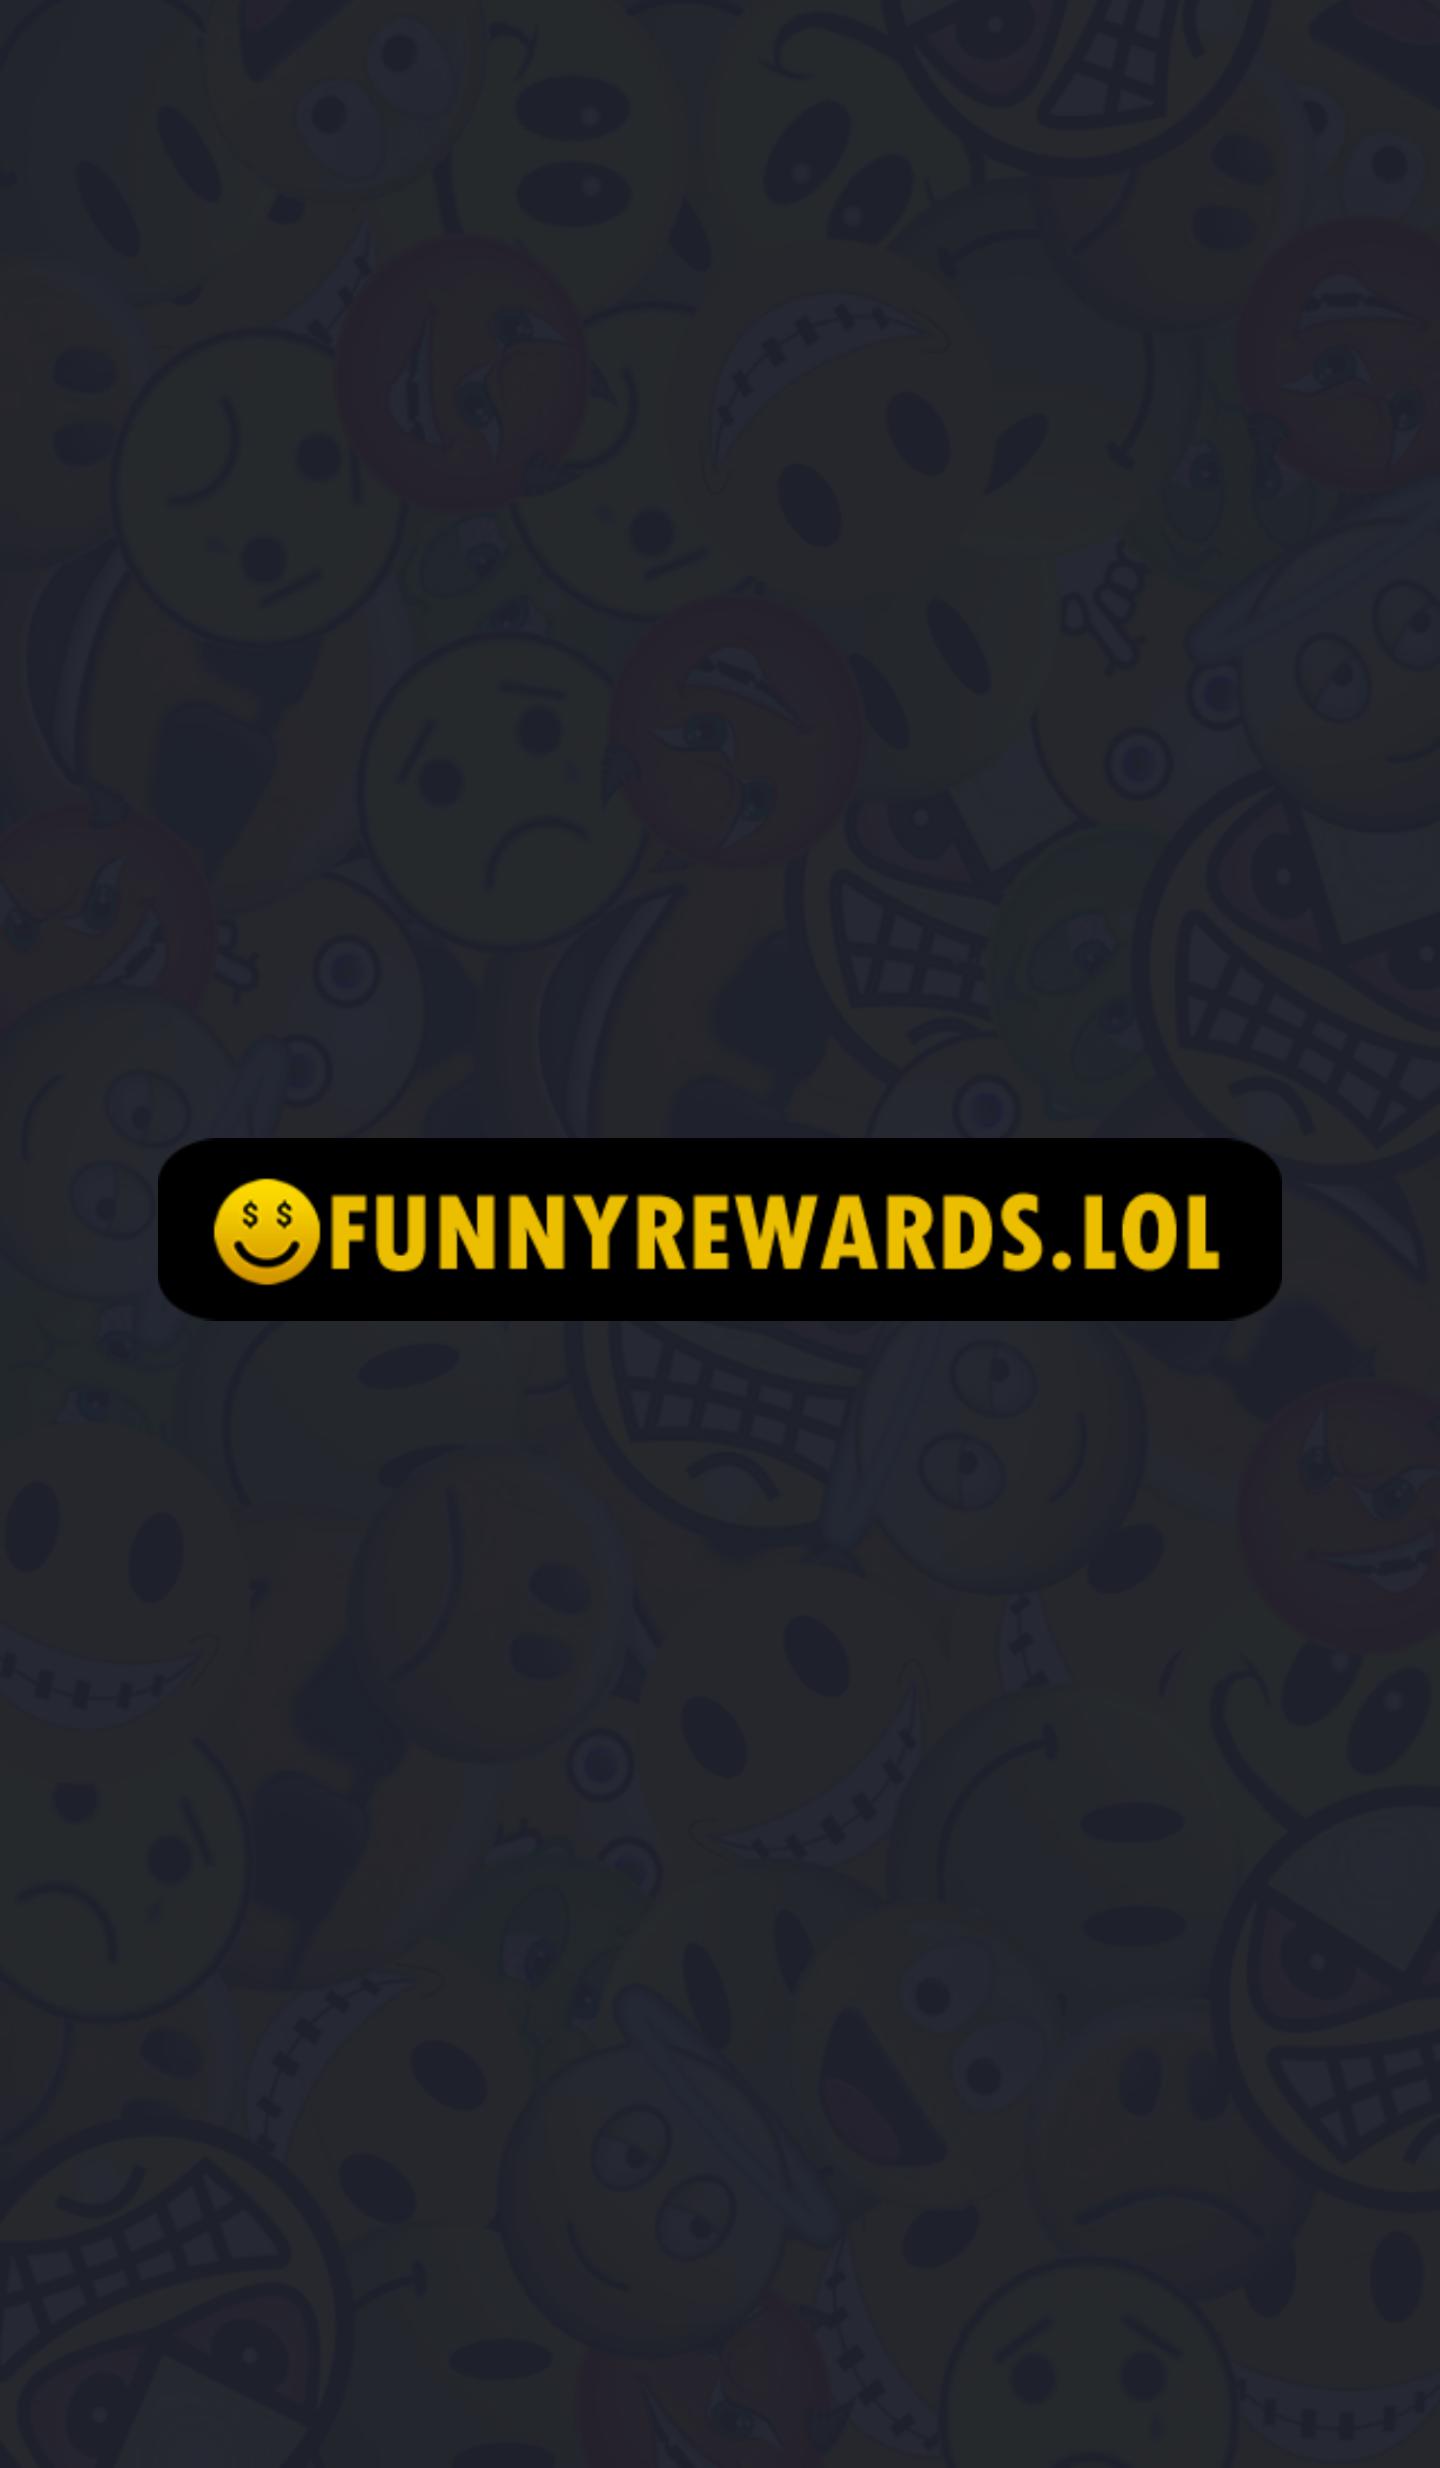 Funny Rewards